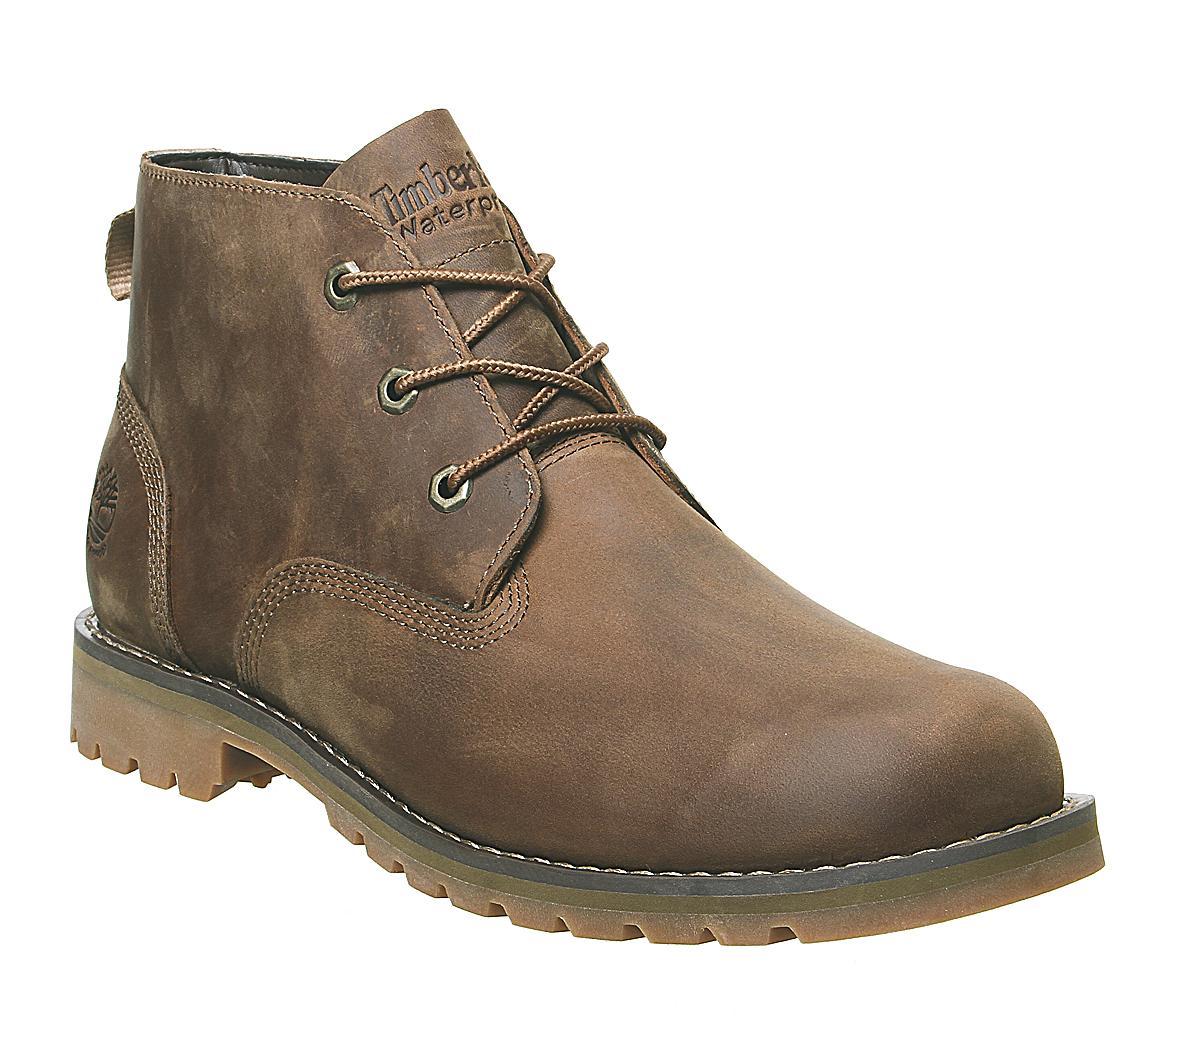 Extracción Tranquilidad de espíritu escaramuza  Timberland Larchmont Chukka Waterproof Boots Dark Brown Full Grain - Boots